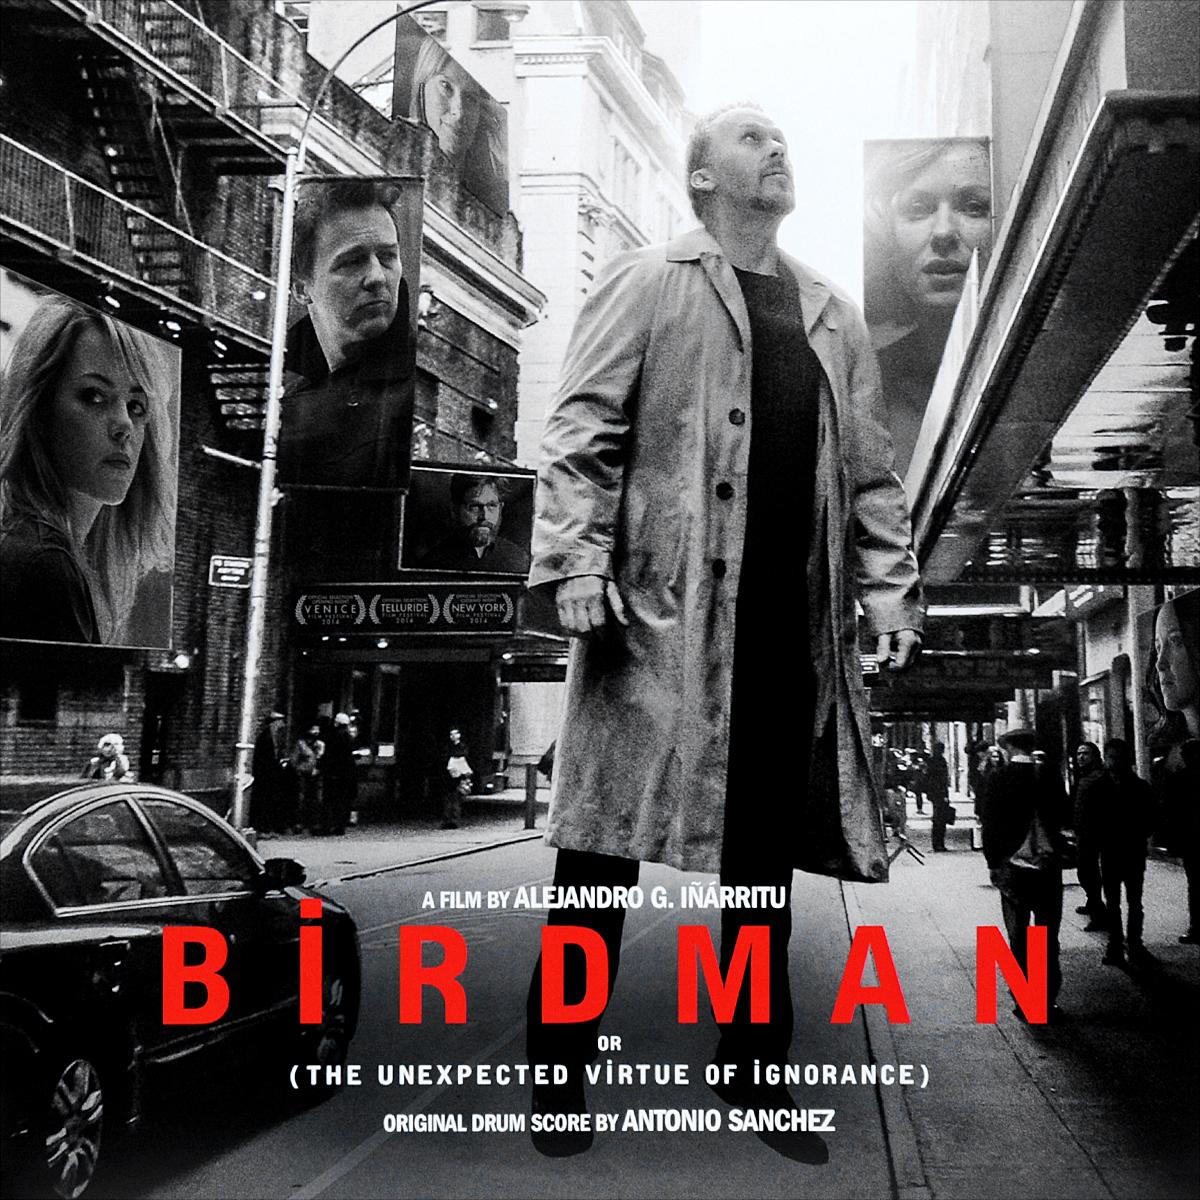 Birdman. Original Drum Score By Antonio Sanchez (2 LP)